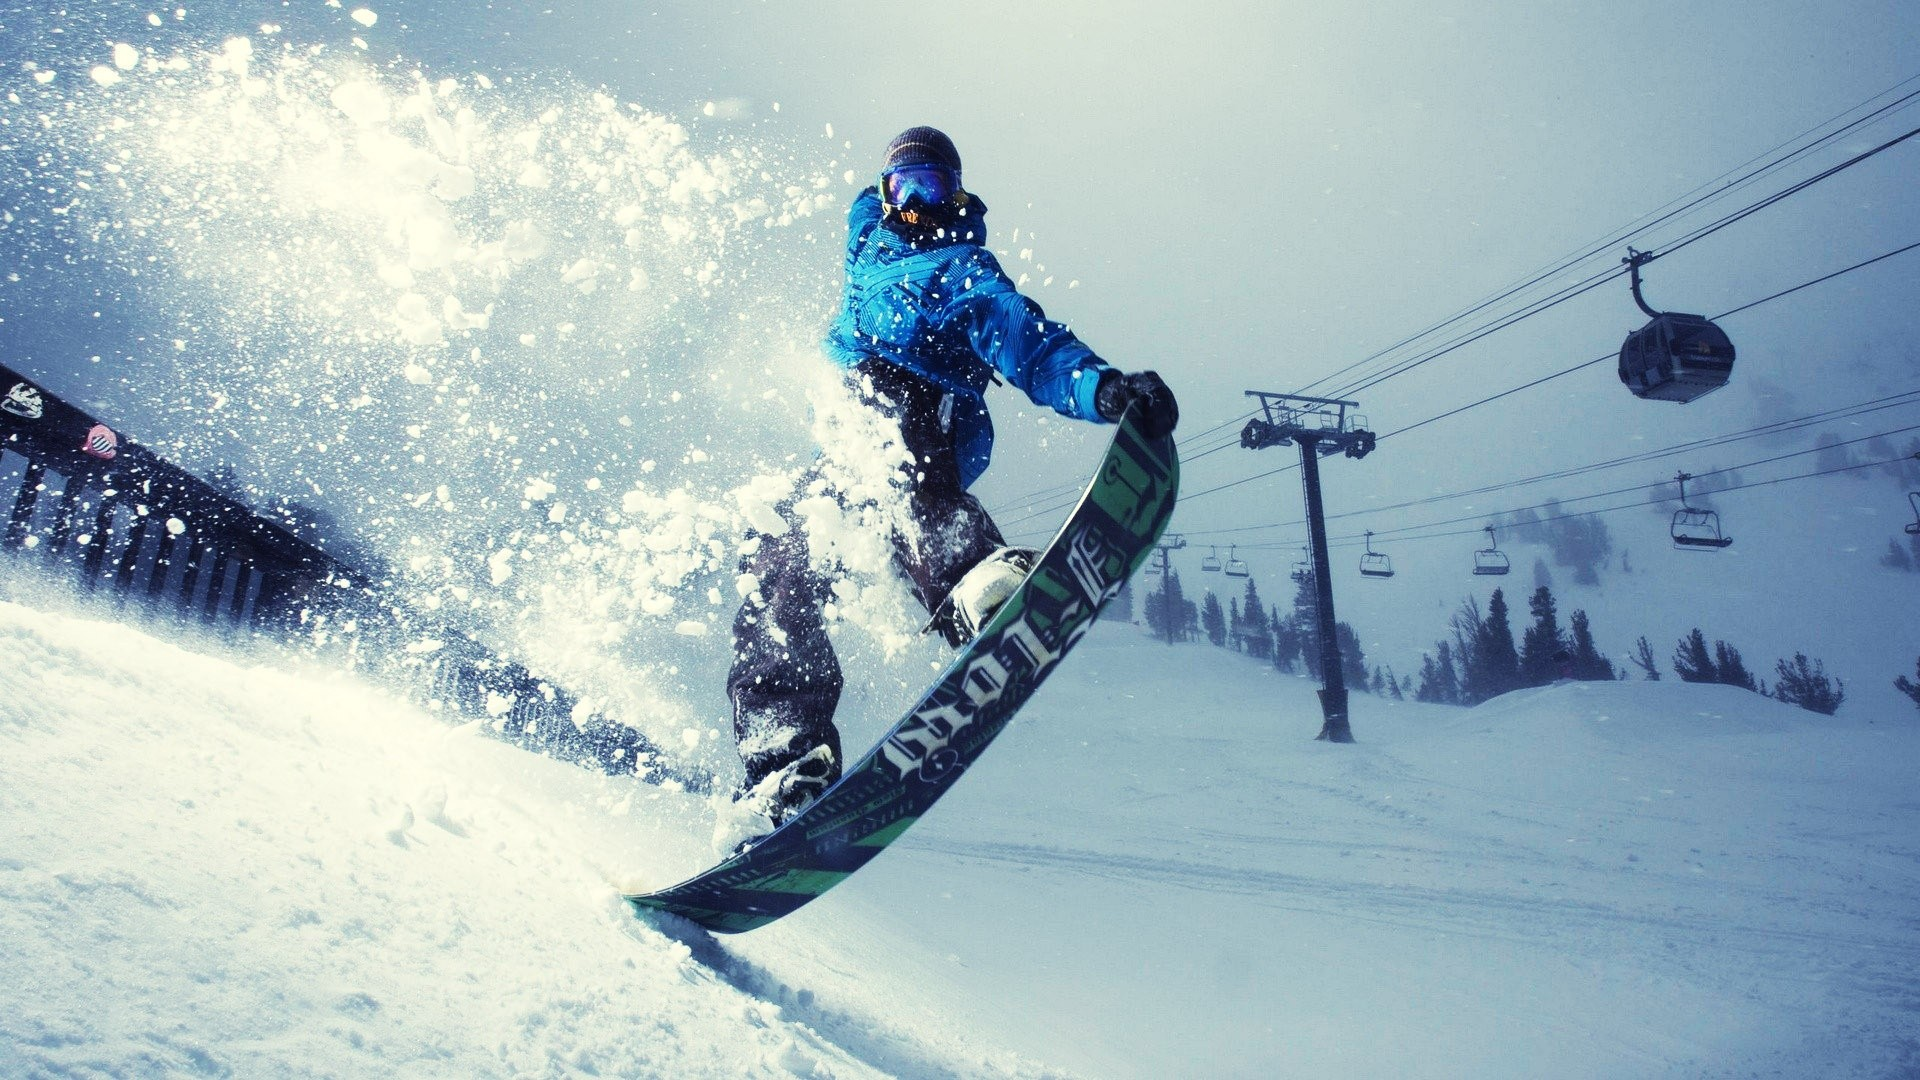 Sport_Snowboard_035608_